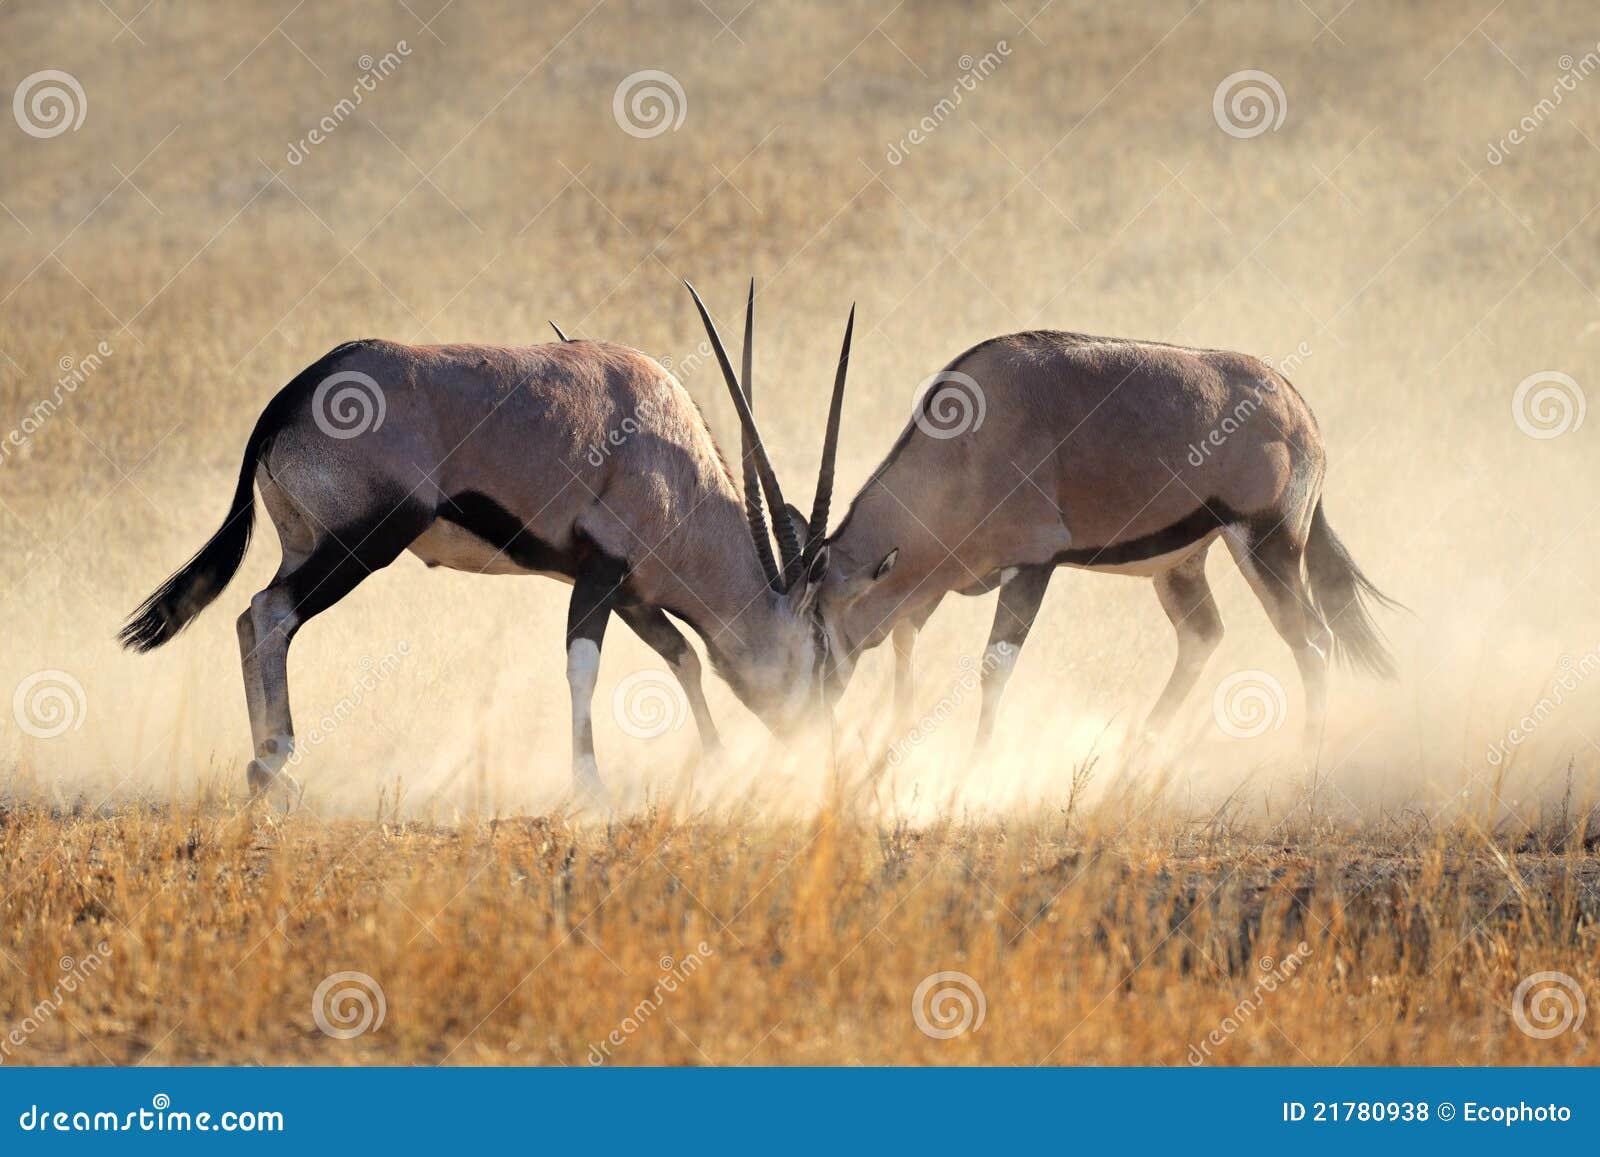 Fighting Gemsbok Royalty Free Stock Photos - Image: 21780938